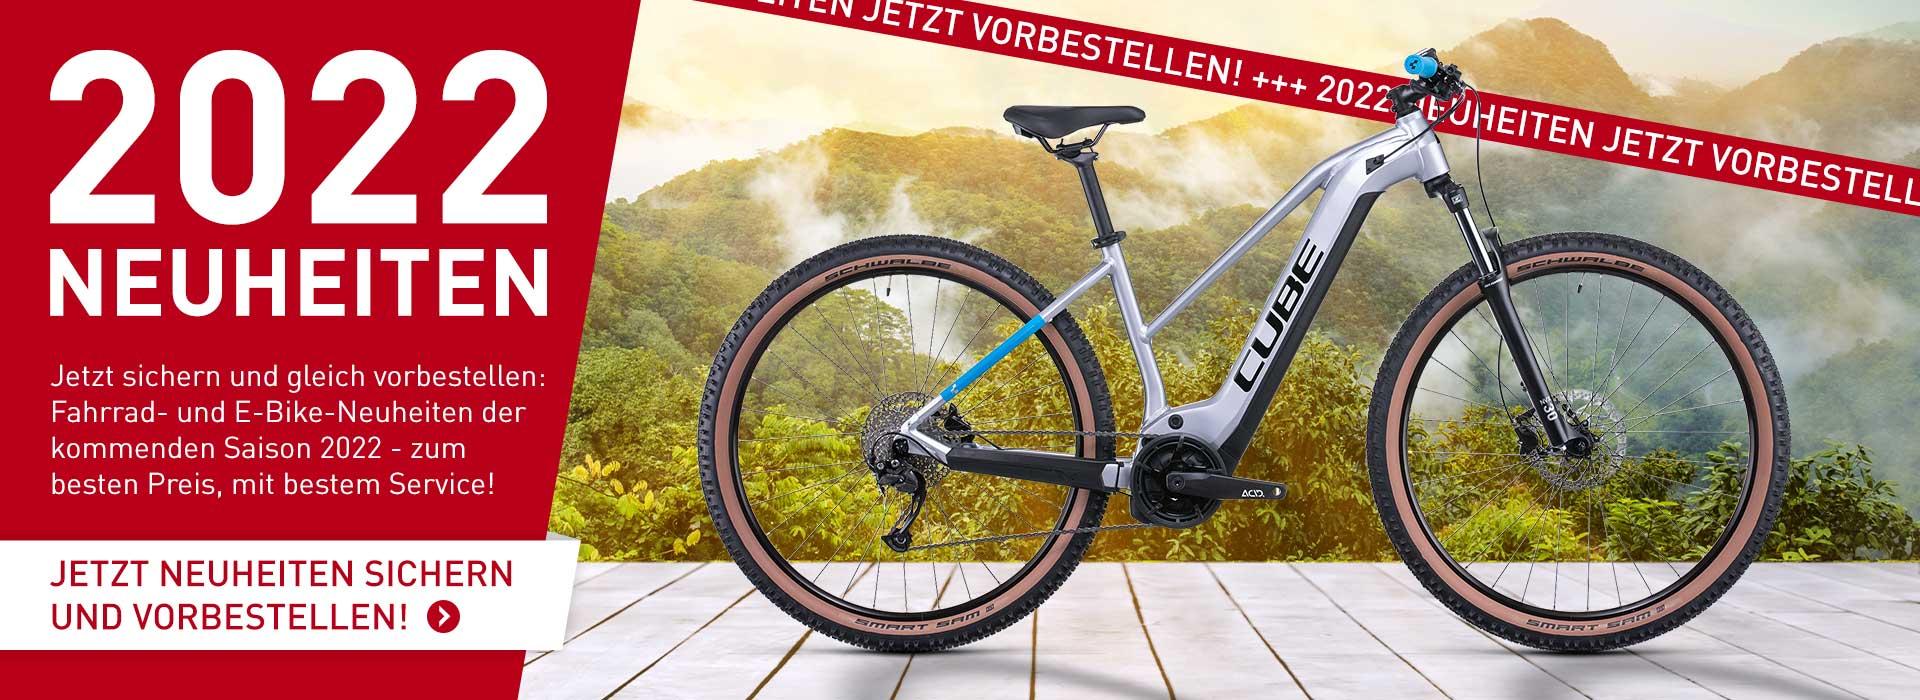 Cube Neuheiten Bikes 2022